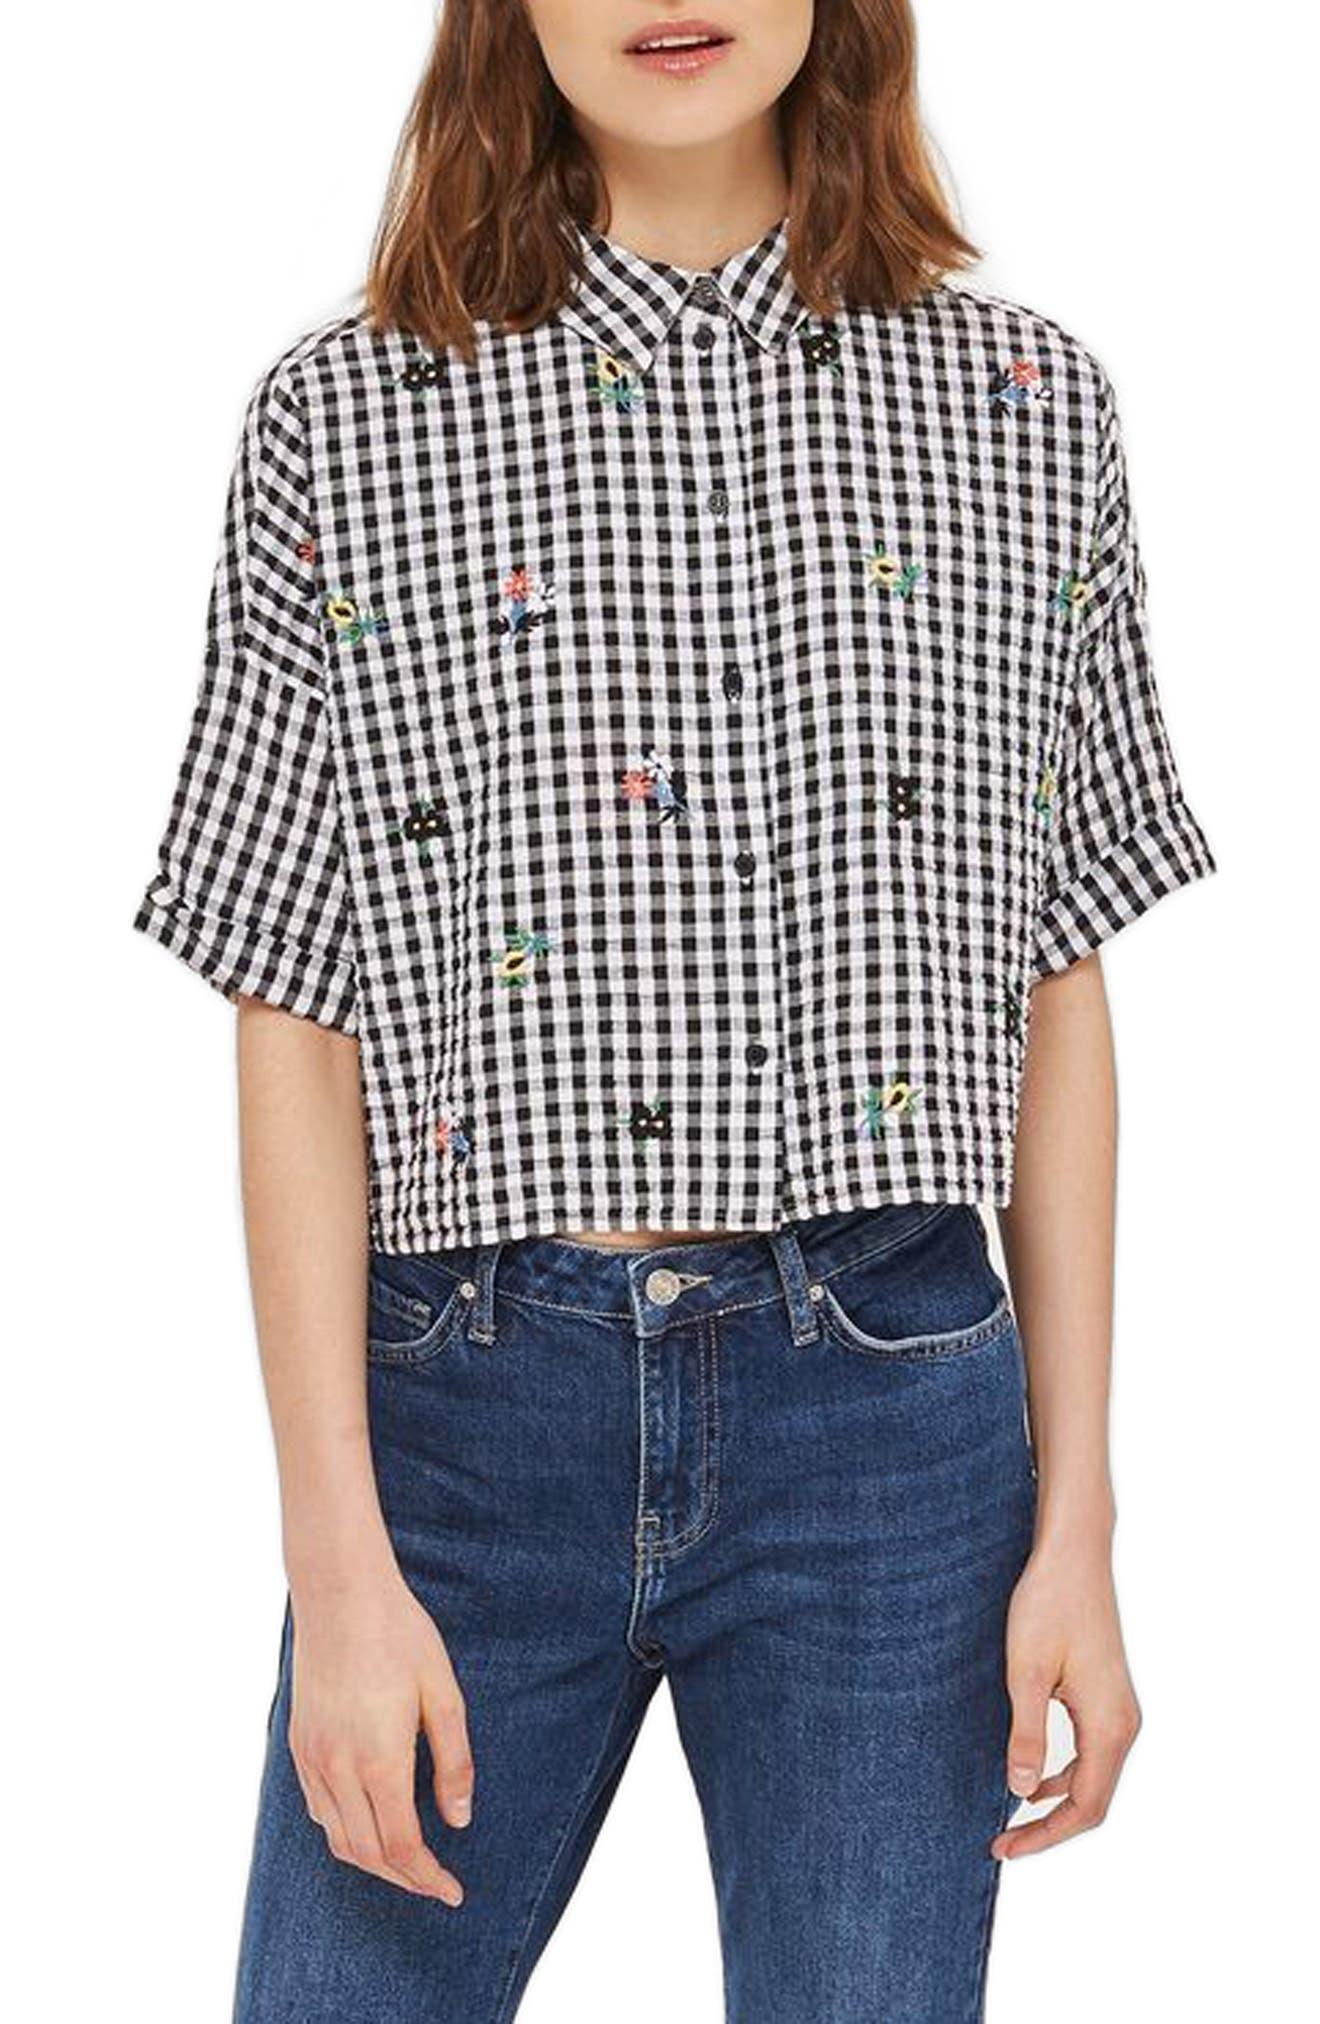 Topshop Kady Embroidered Gingham Shirt (Regular & Petite)